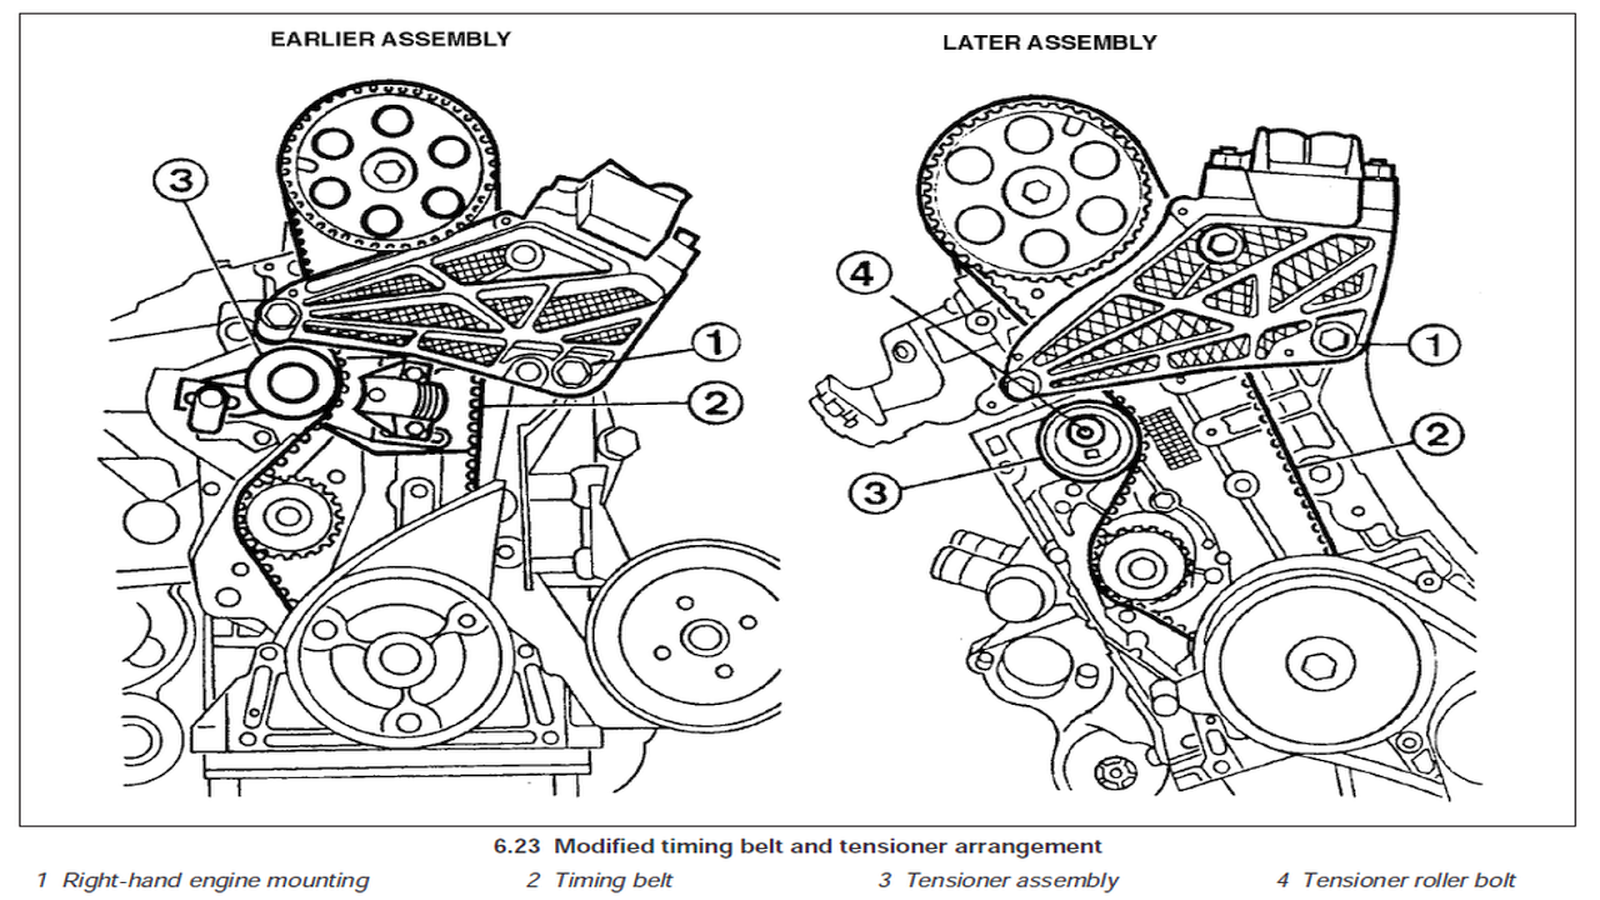 Citroen Berlingo Wiring Diagram Pdf Auto Electrical 99 Honda Passport Fuse Box Led Troffer 2002 Mercury Outboard 2001 Engine H3 Panel 2000 Audi Tt Body Kits